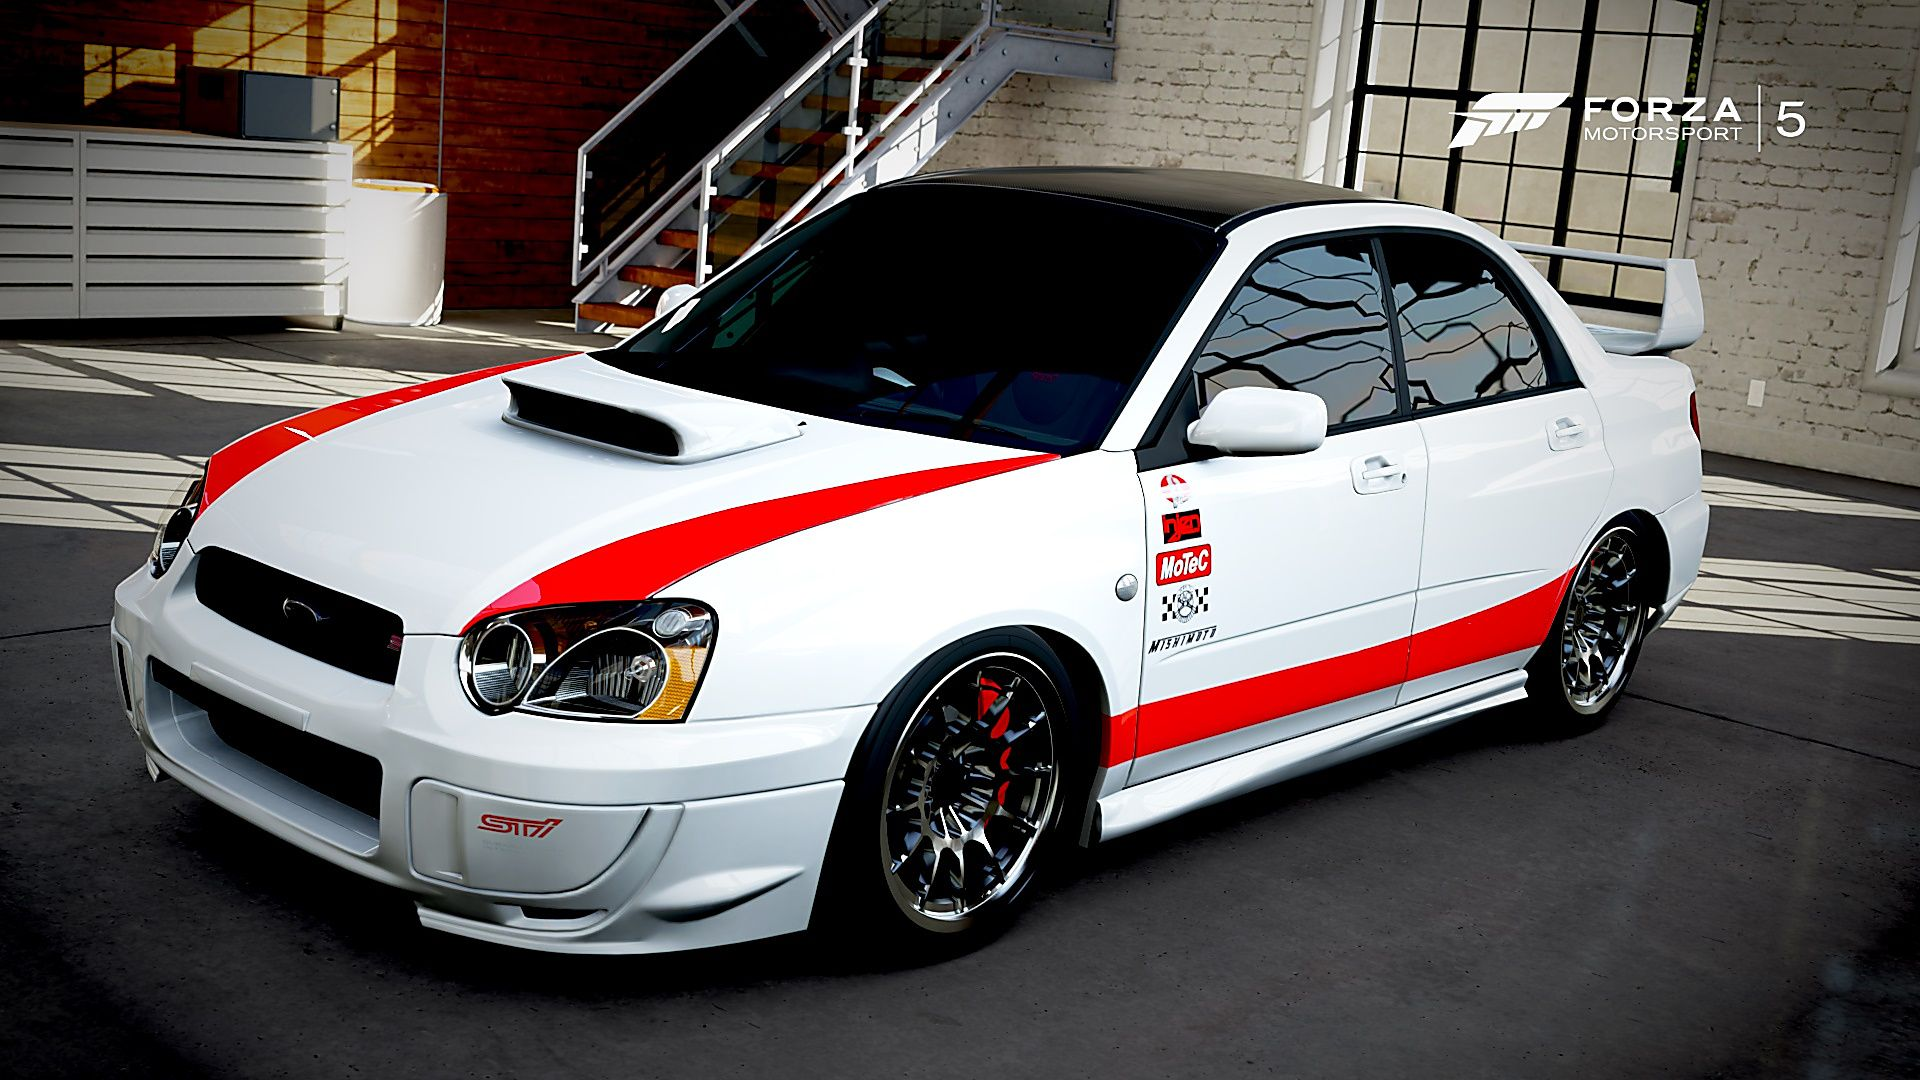 Born To Race Subaru Wrx Cool Sports Cars Street Racing Cars Wrx